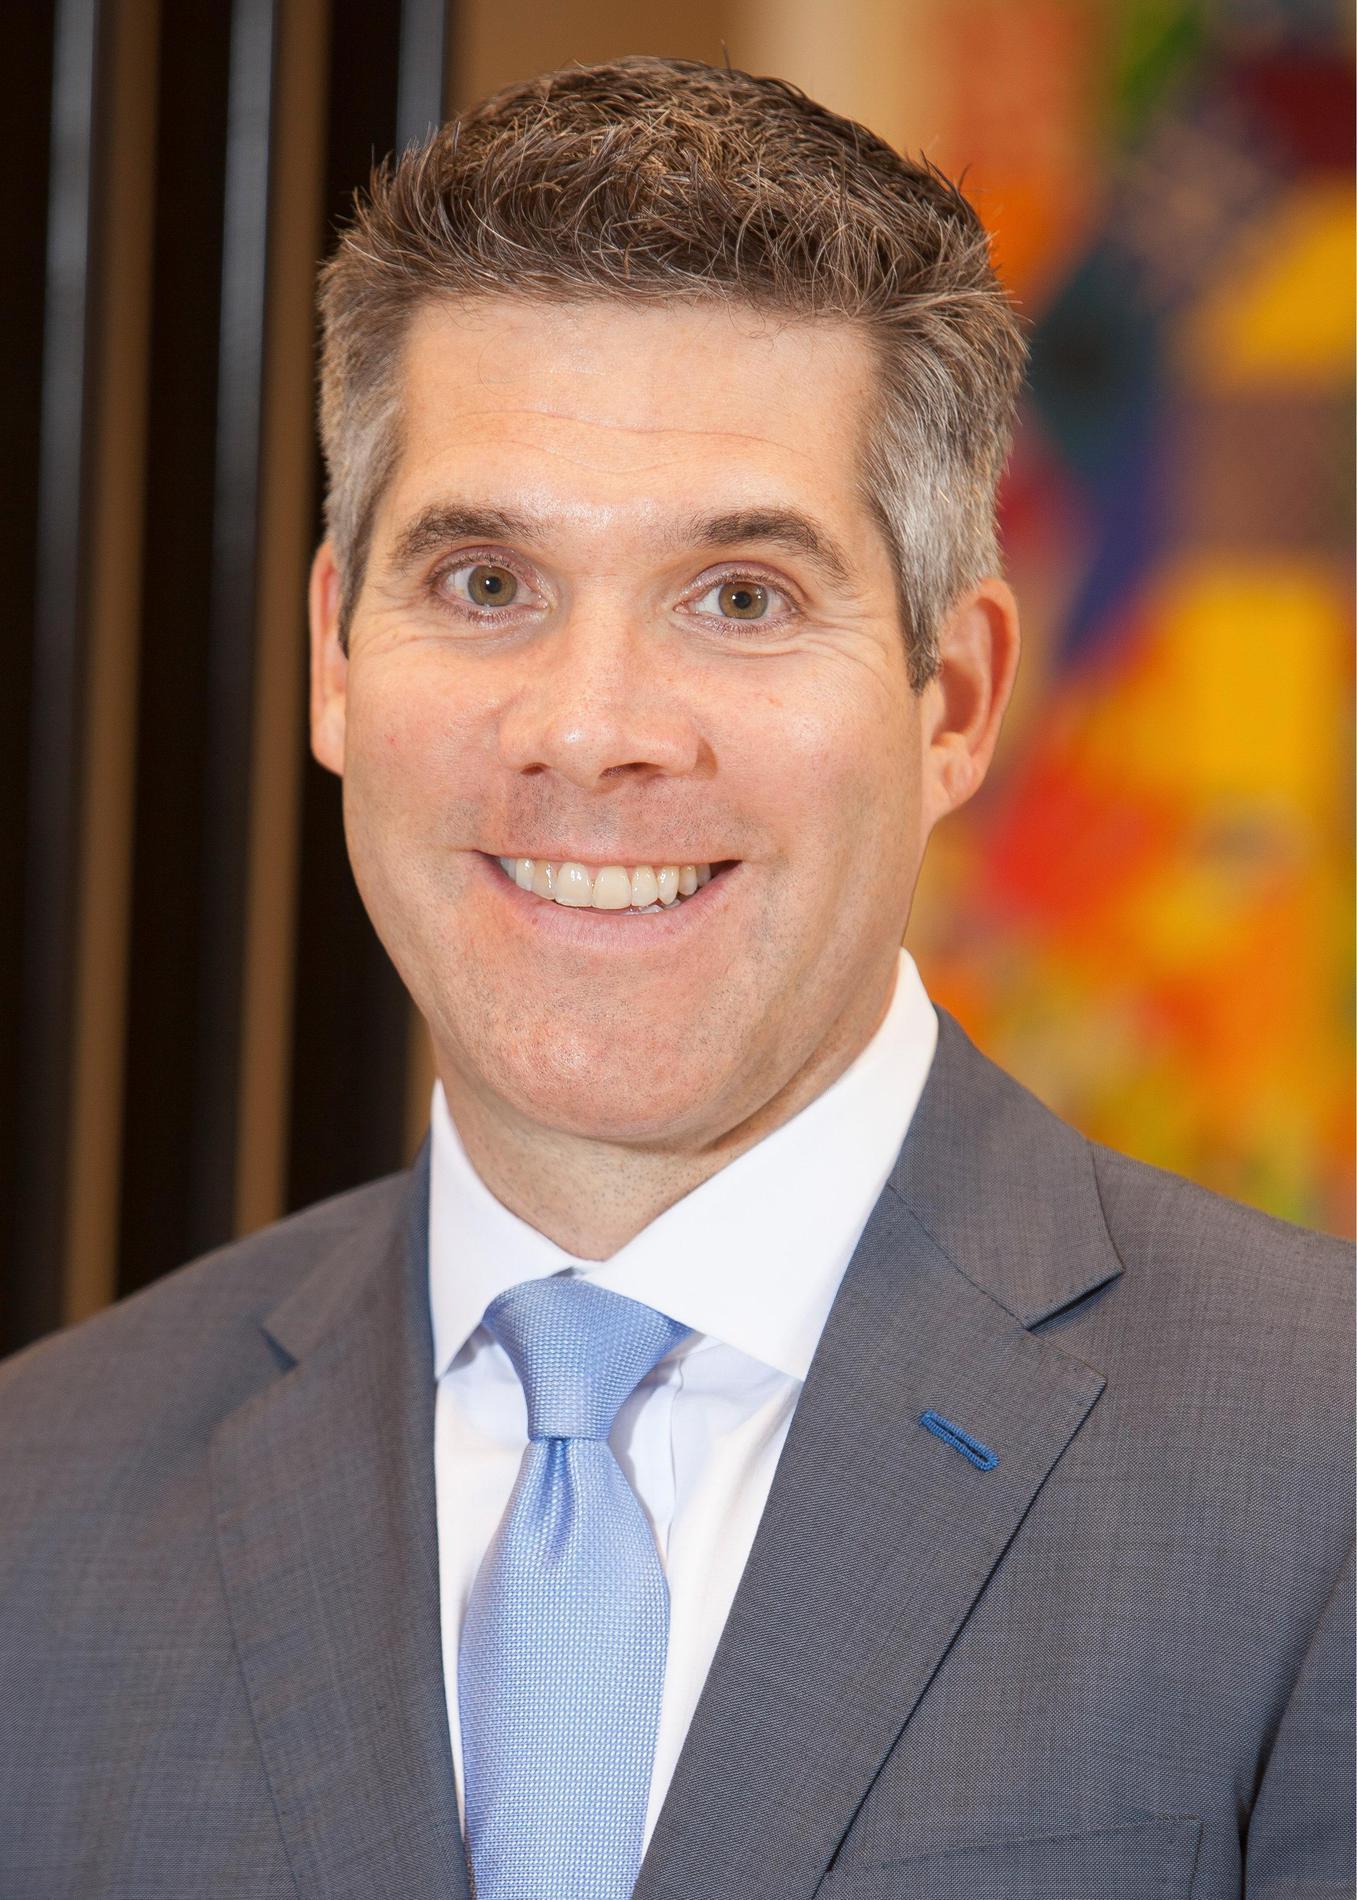 Chad J Essington | Chicago, IL | Morgan Stanley Wealth